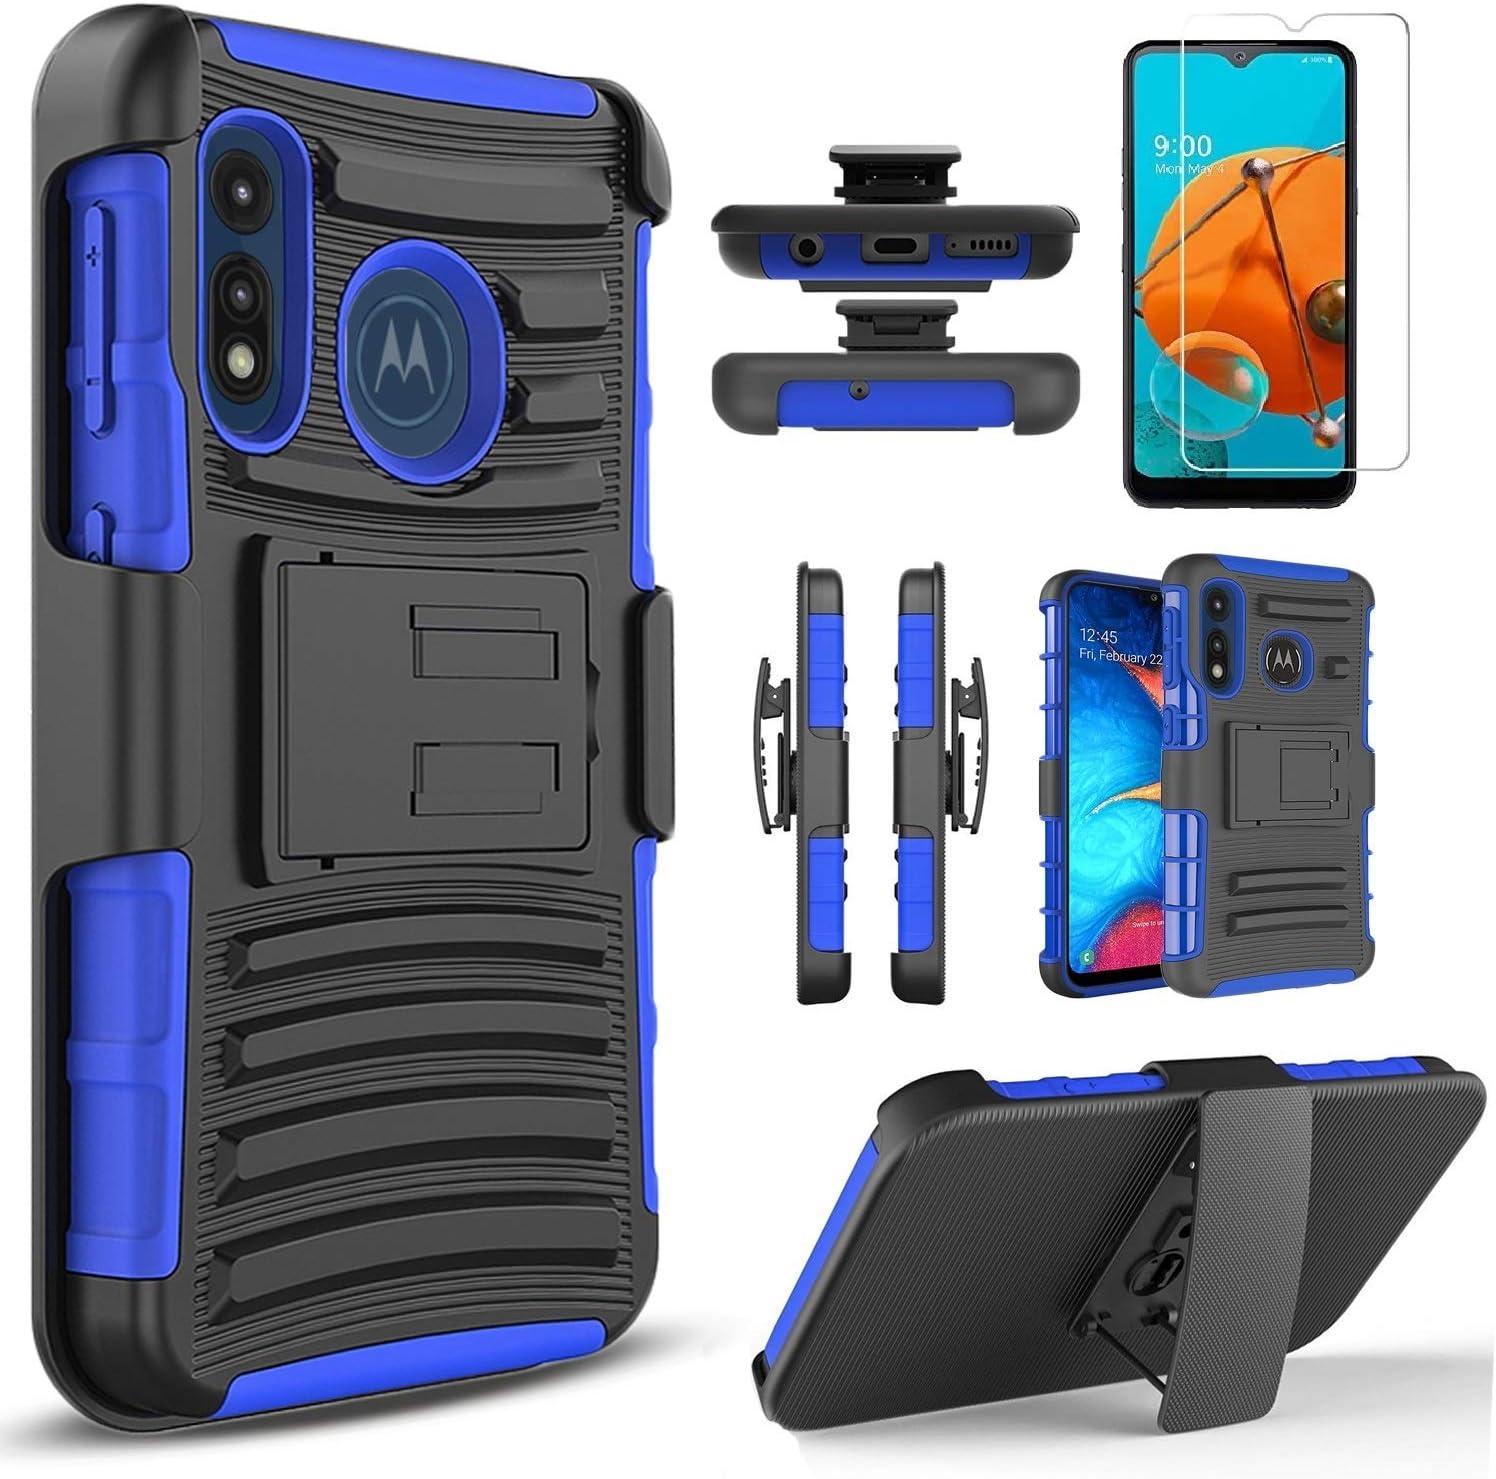 Circlemalls- Moto E Phone Case, Motorola Moto E 2020 Case, [NOT FIT Moto E6/E5/E4/E2] With [Tempered Glass Screen Protector Included], Armor Heavy Duty Kickstand Cover With Belt Clip Holster - Blue